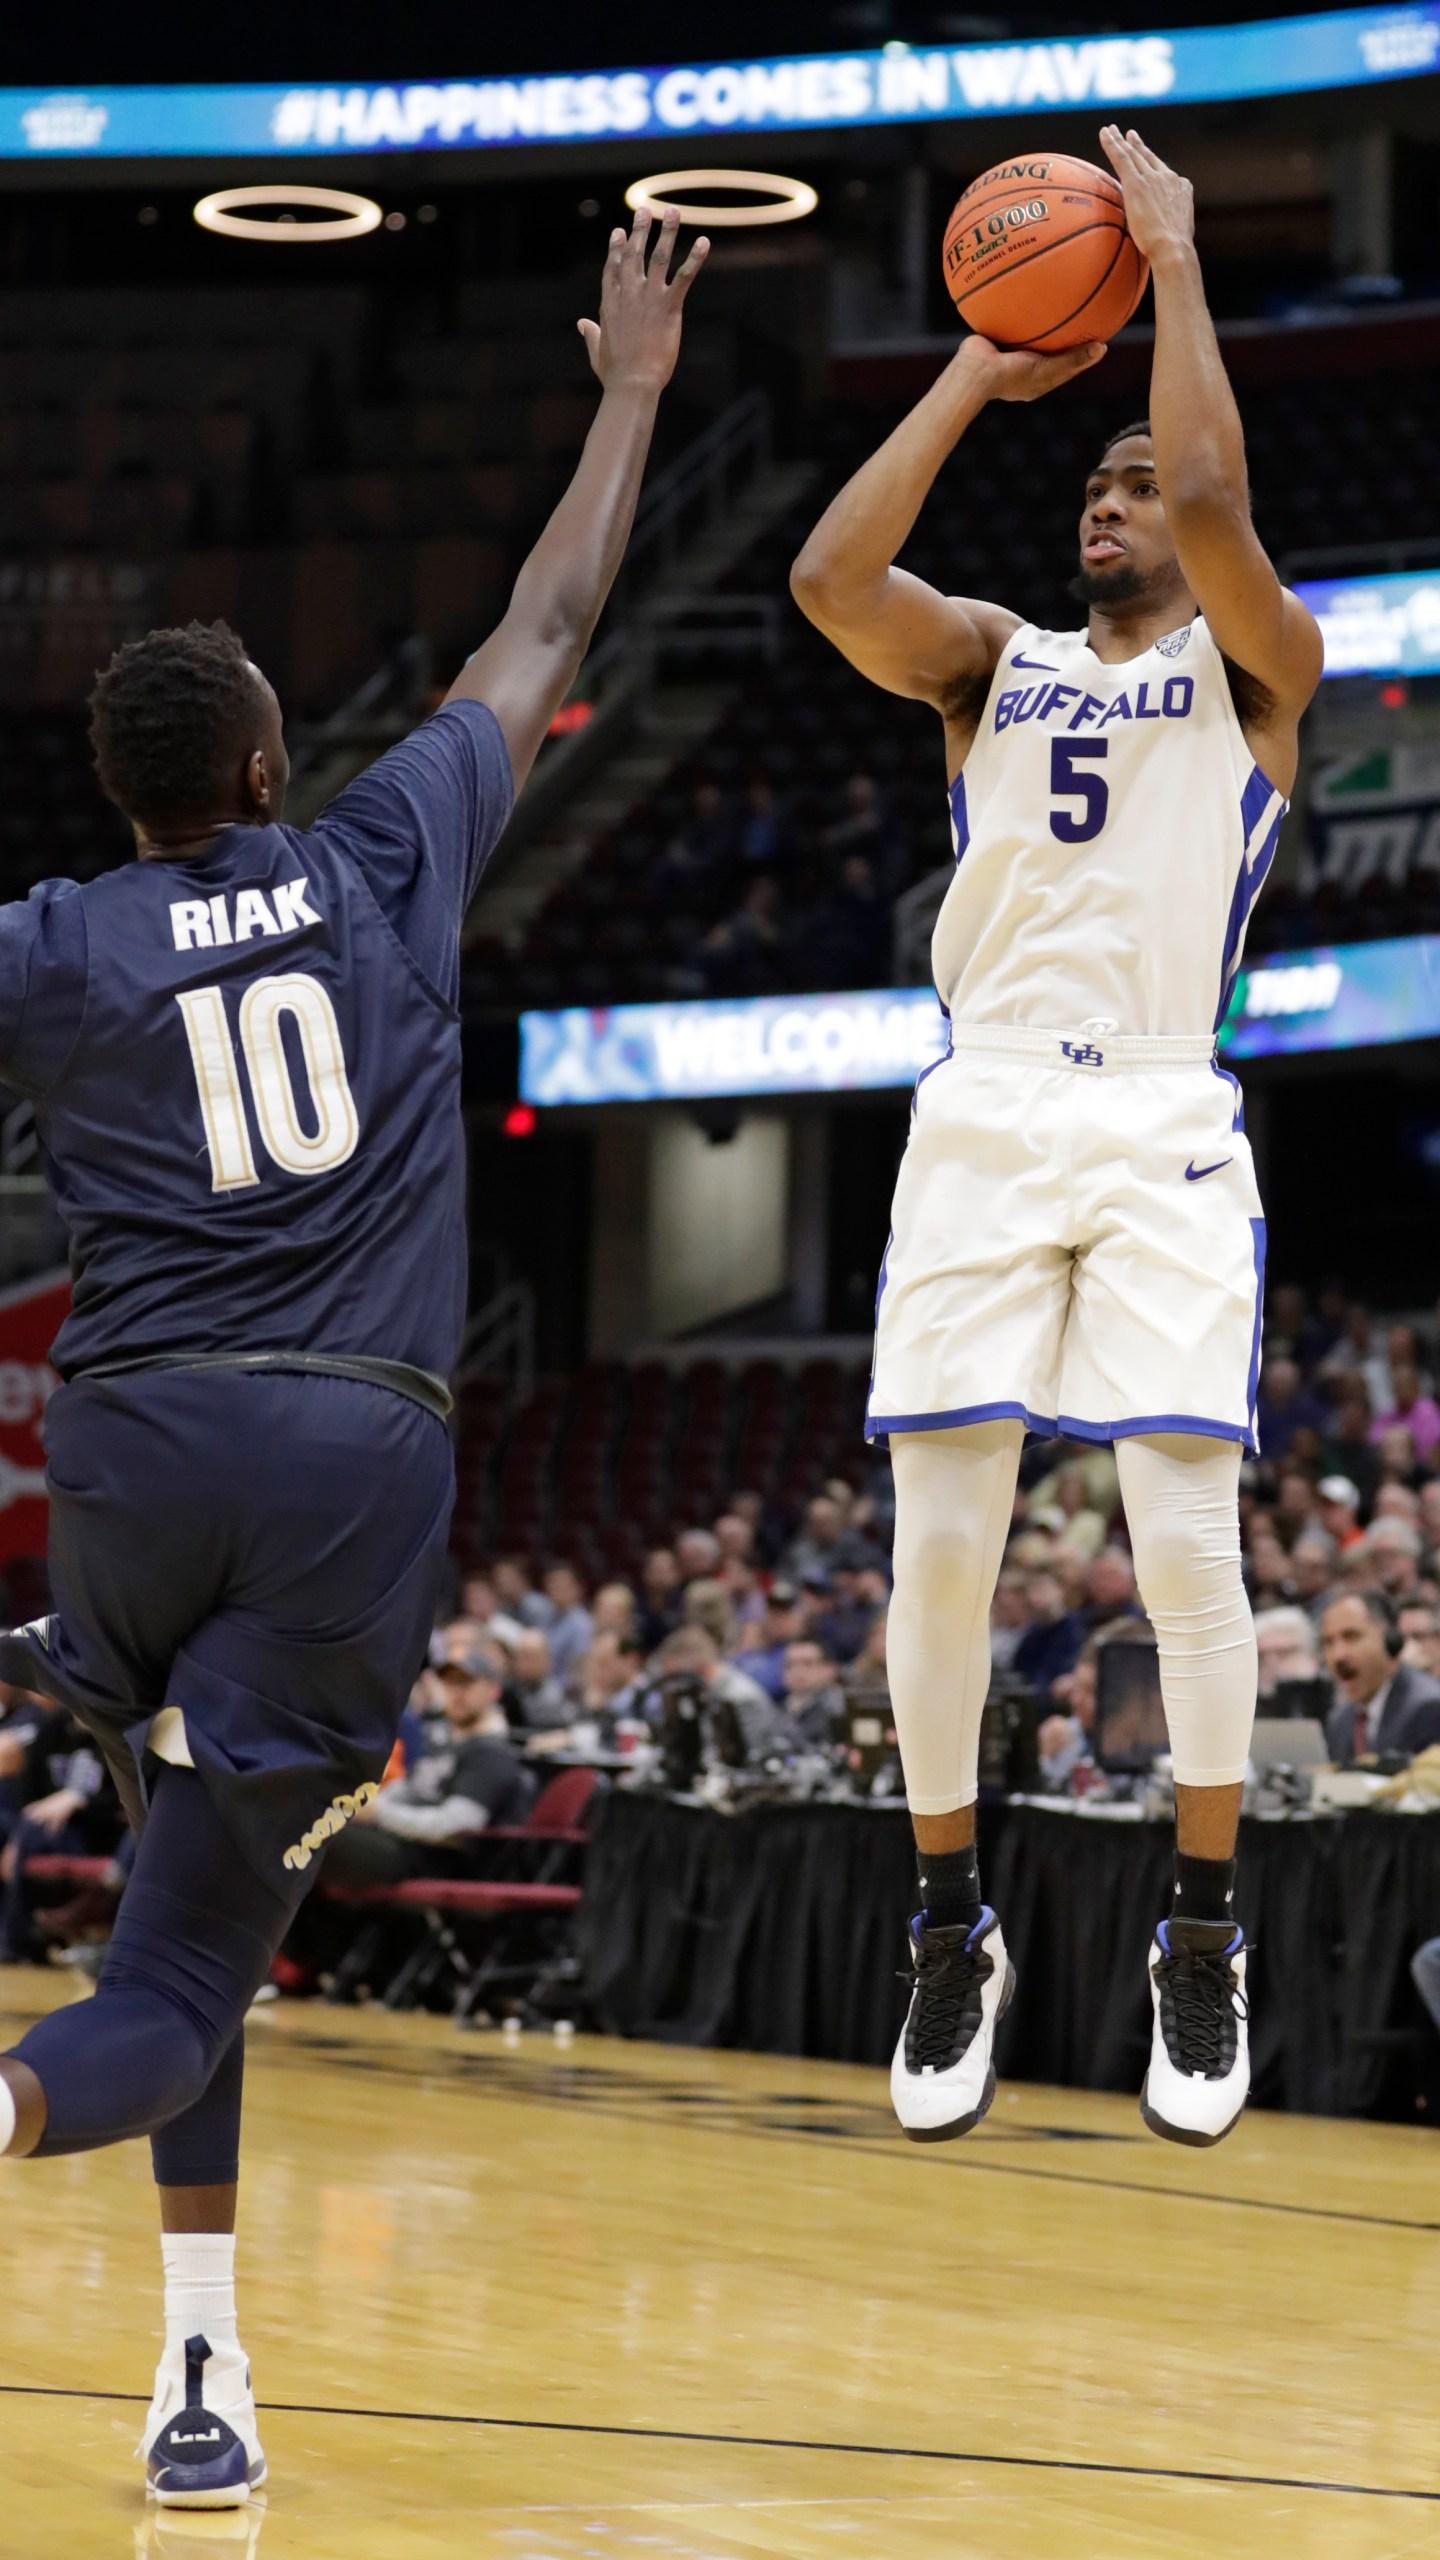 MAC Akron Buffalo Basketball_1561164728262